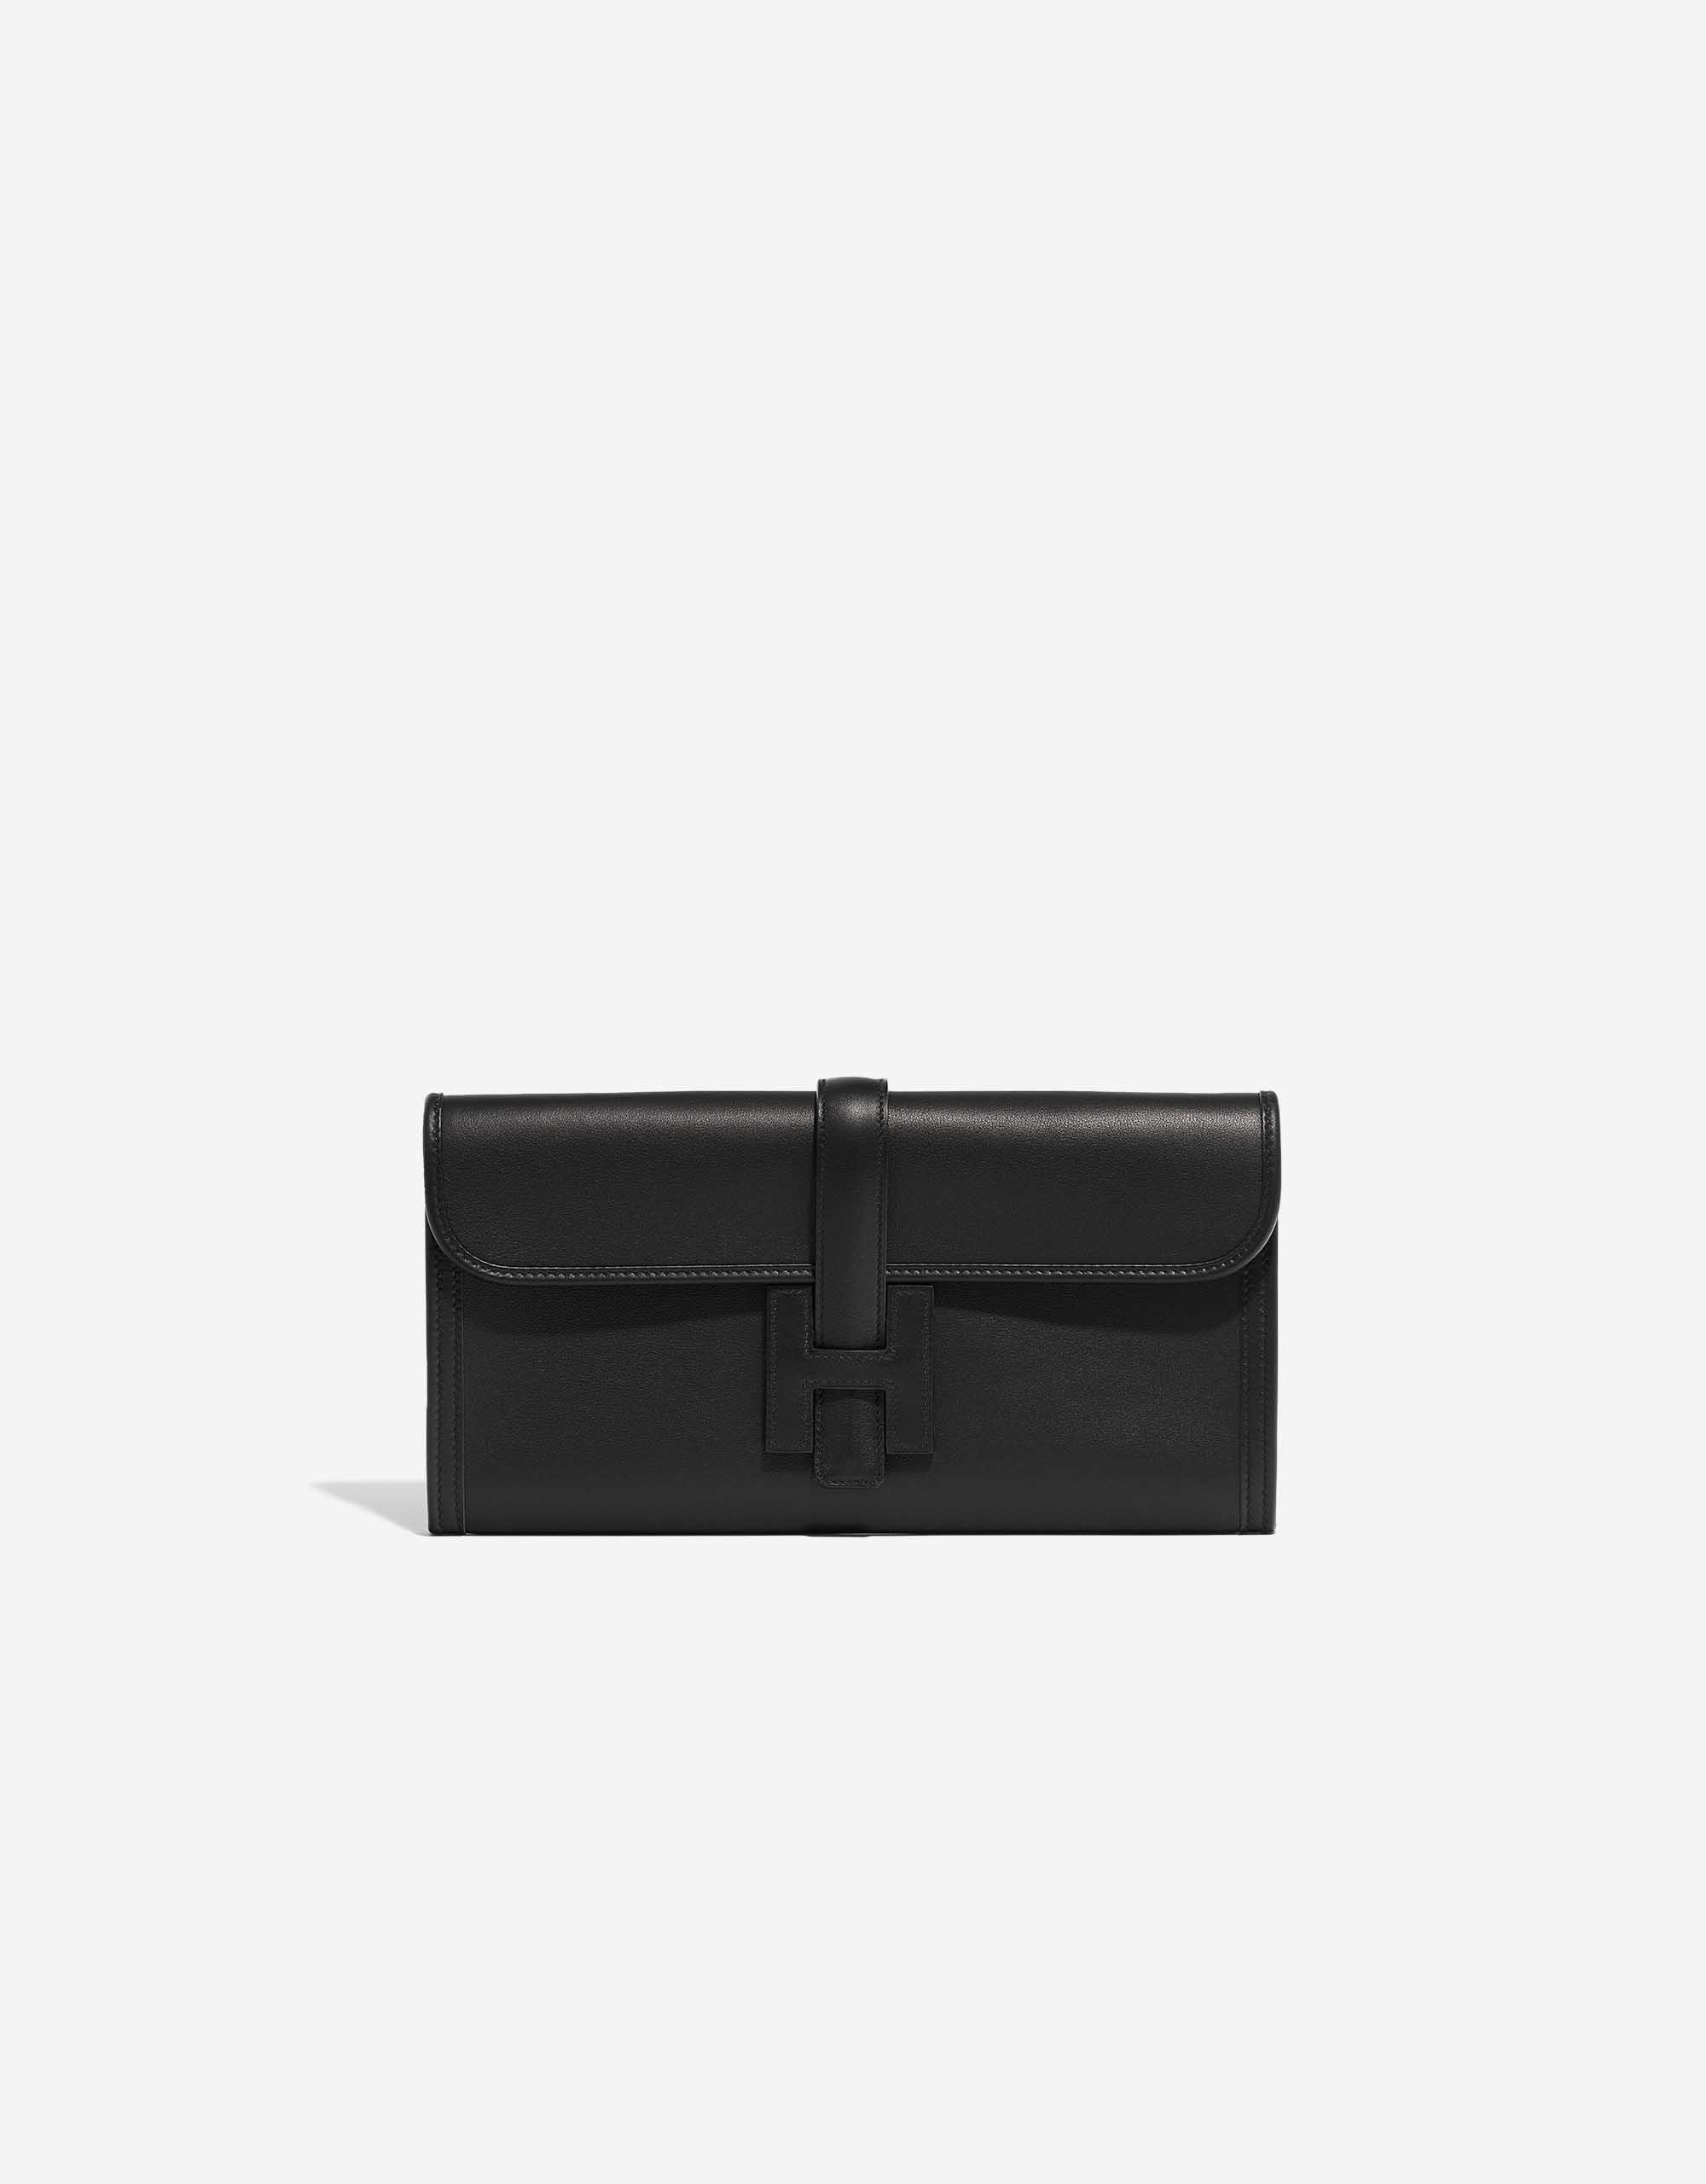 Hermès Jige 29 Swift Black | SACLÀB